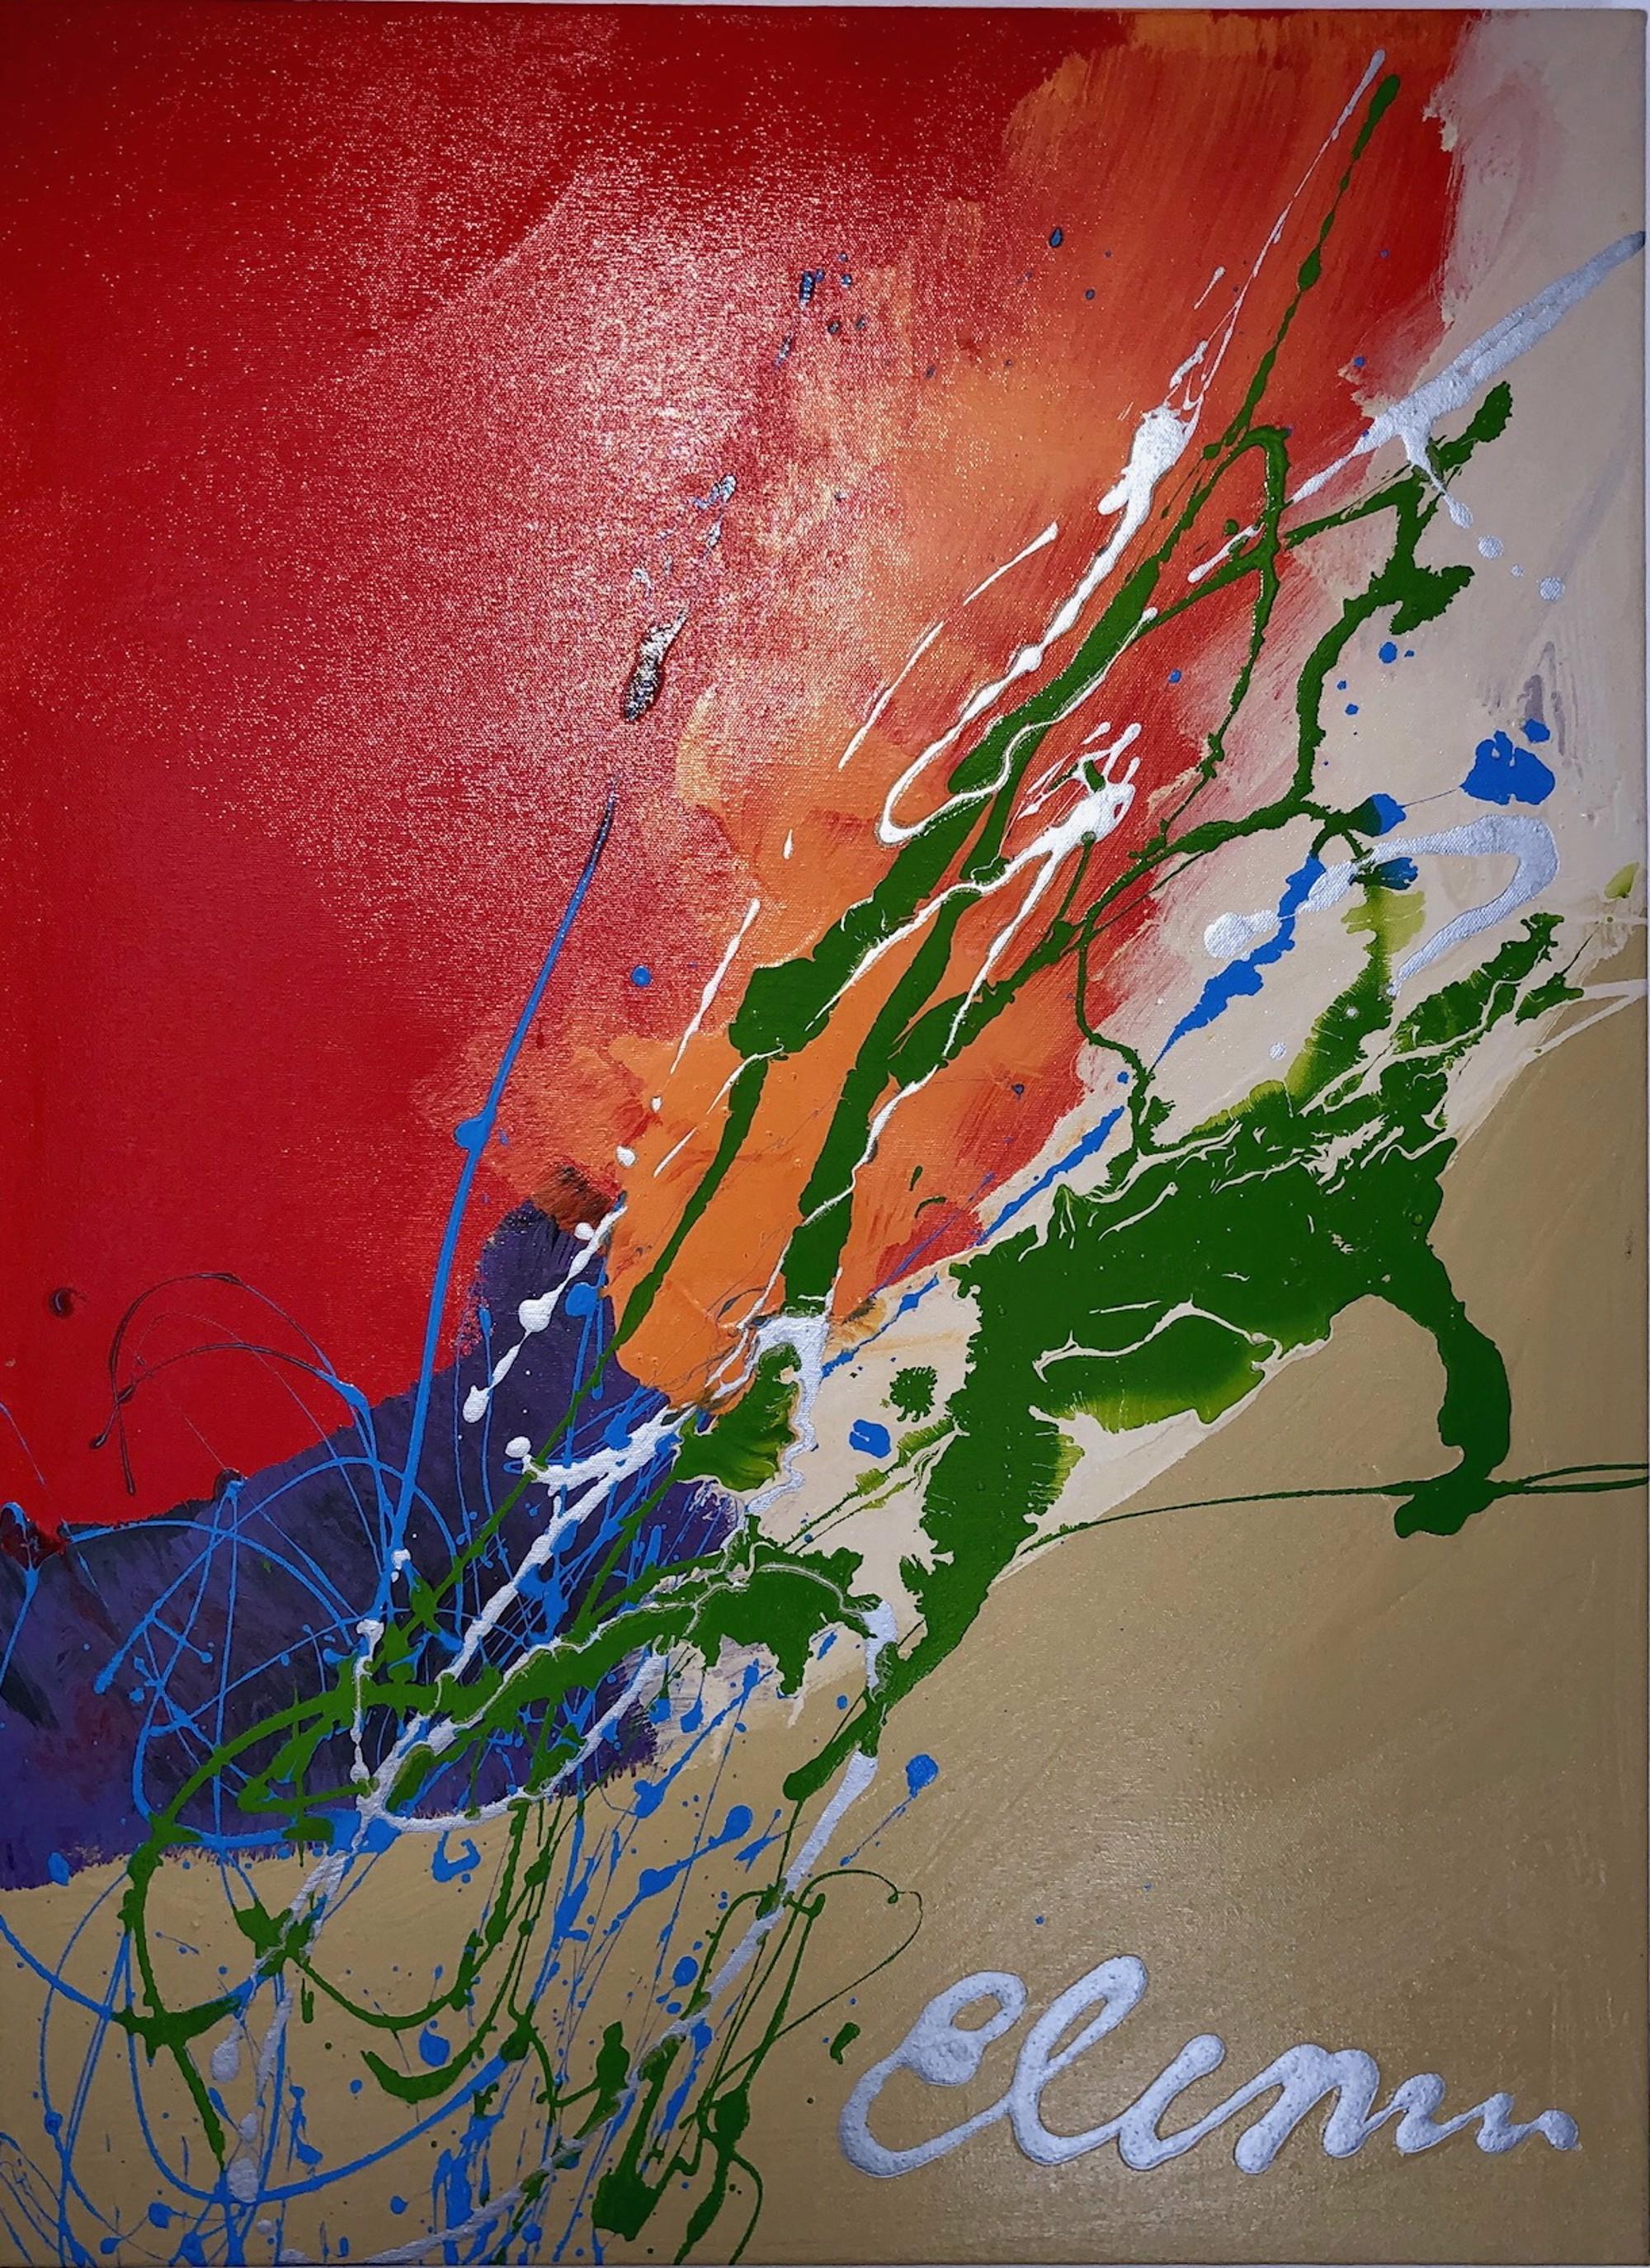 Carpe Diem Series by Elena Bulatova